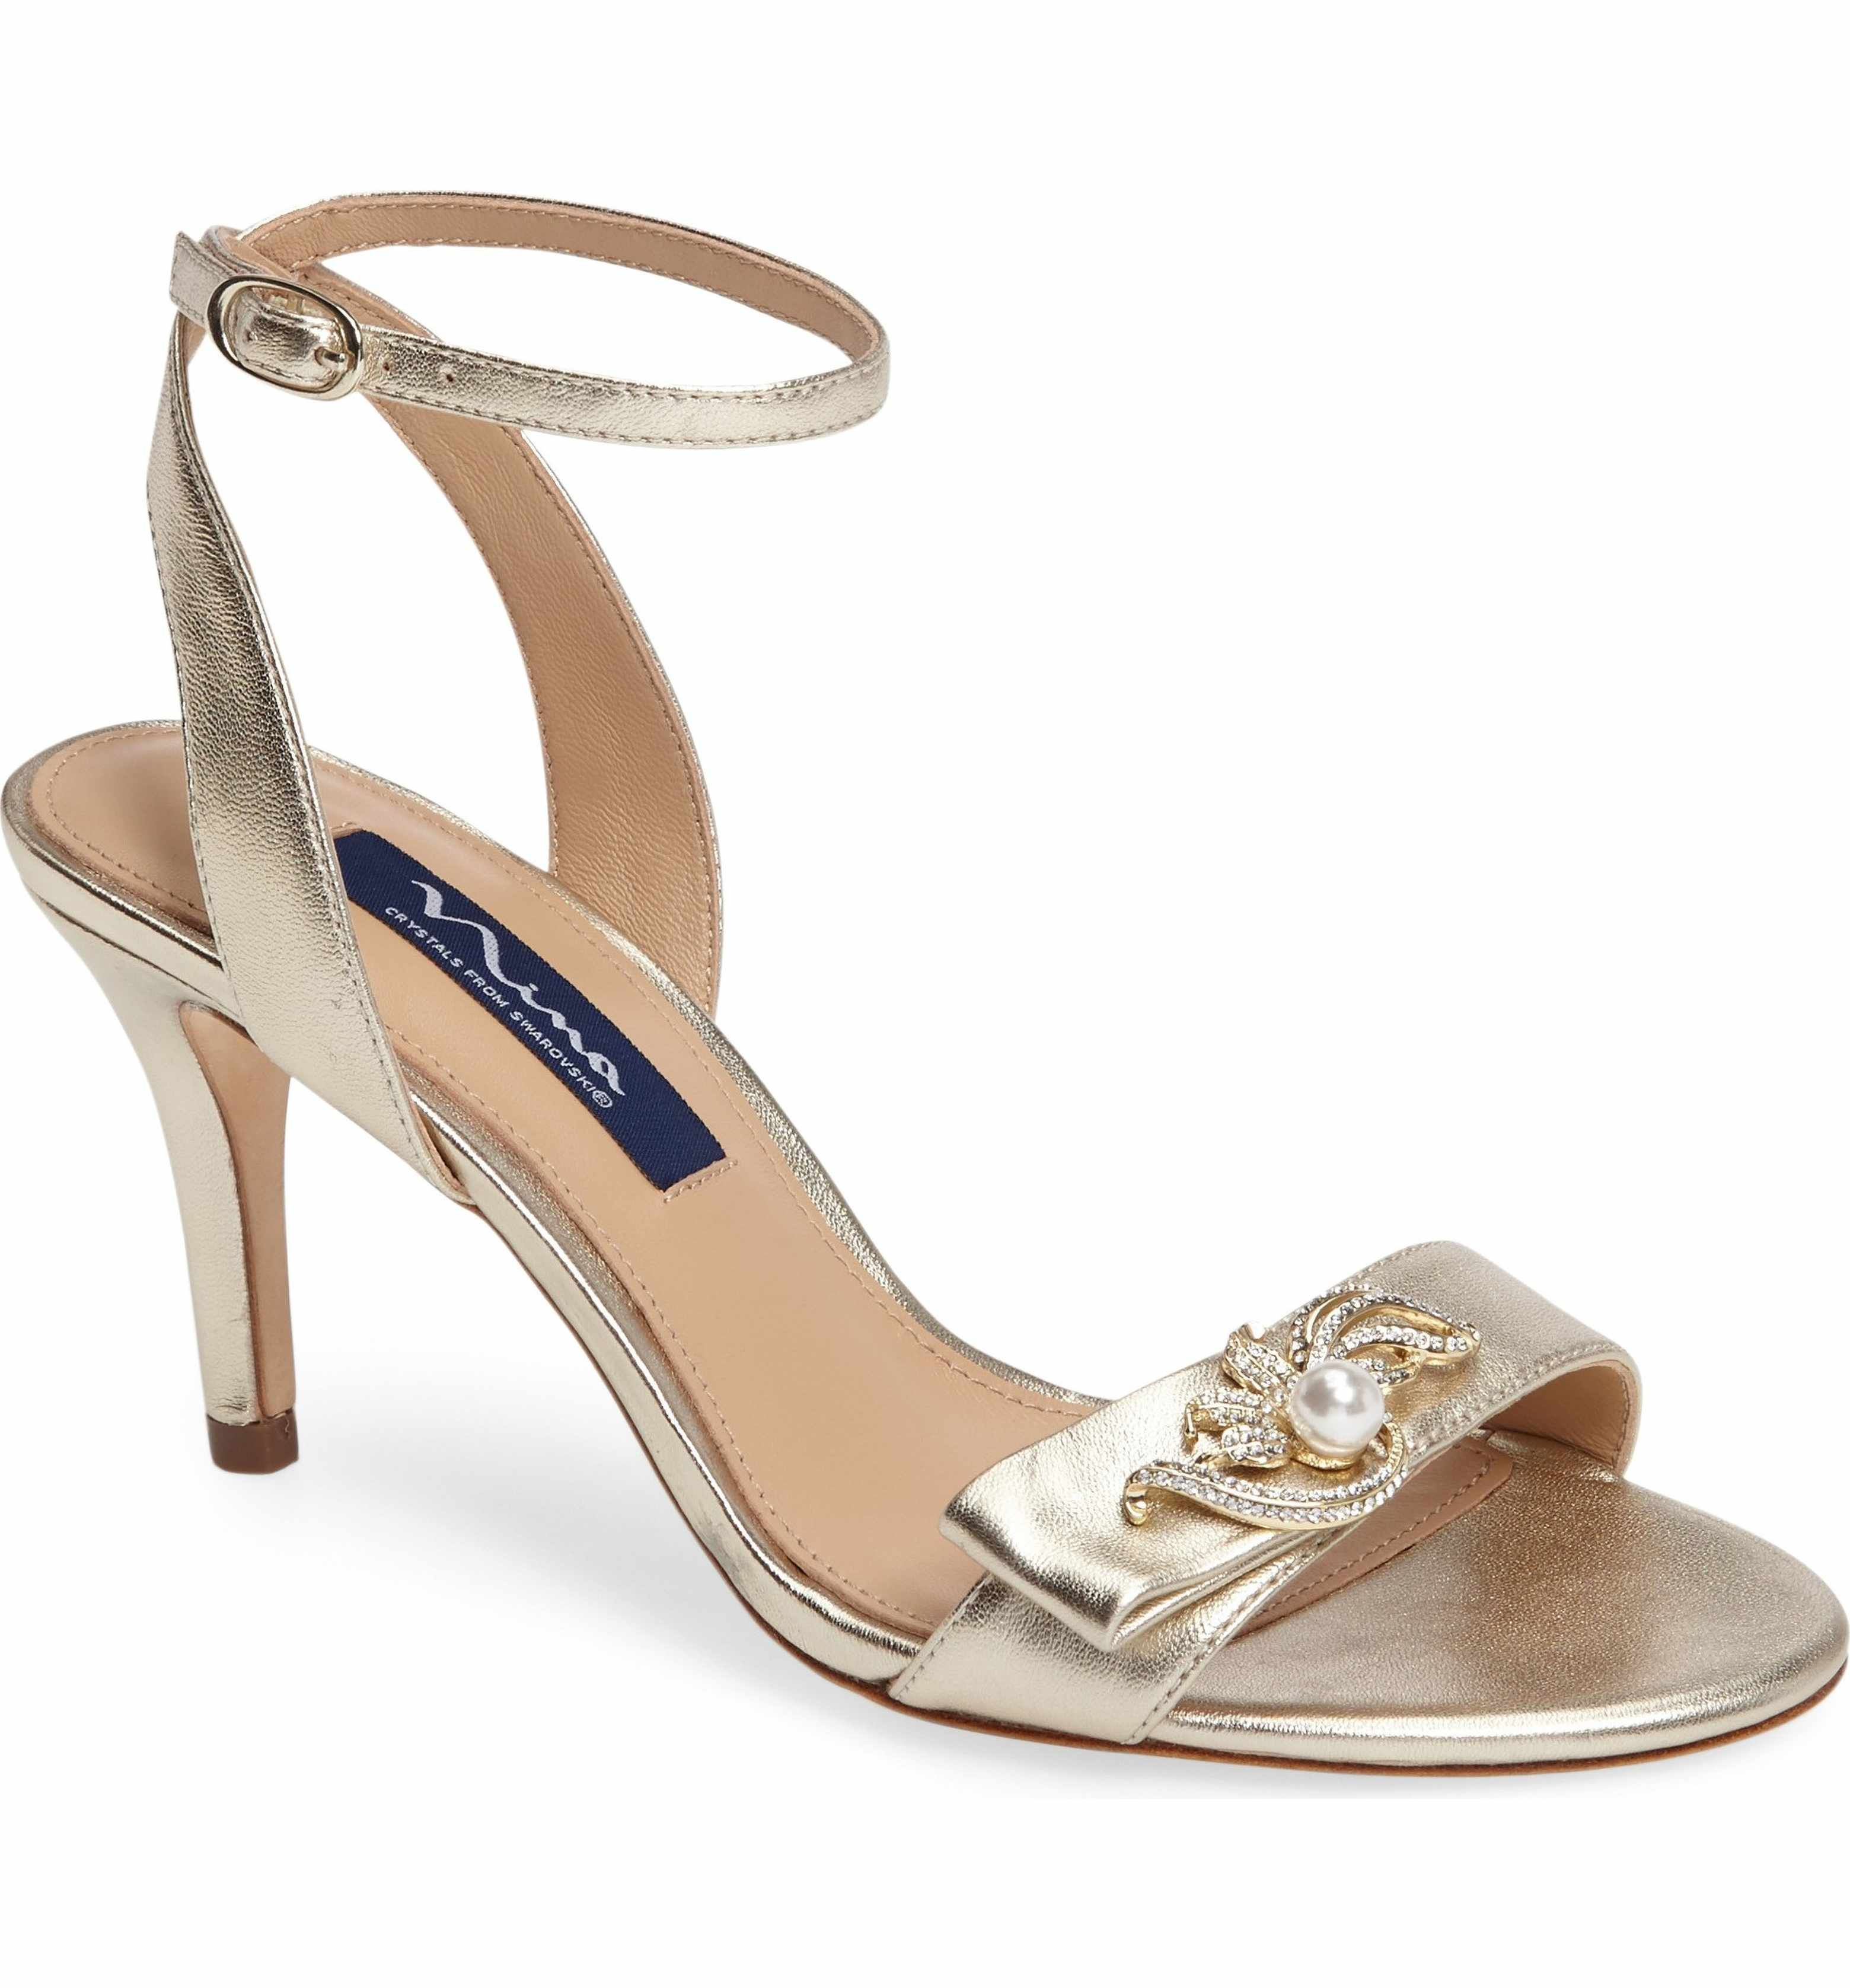 Monroe - Black embellished (crystal & pearls) heeled sandal